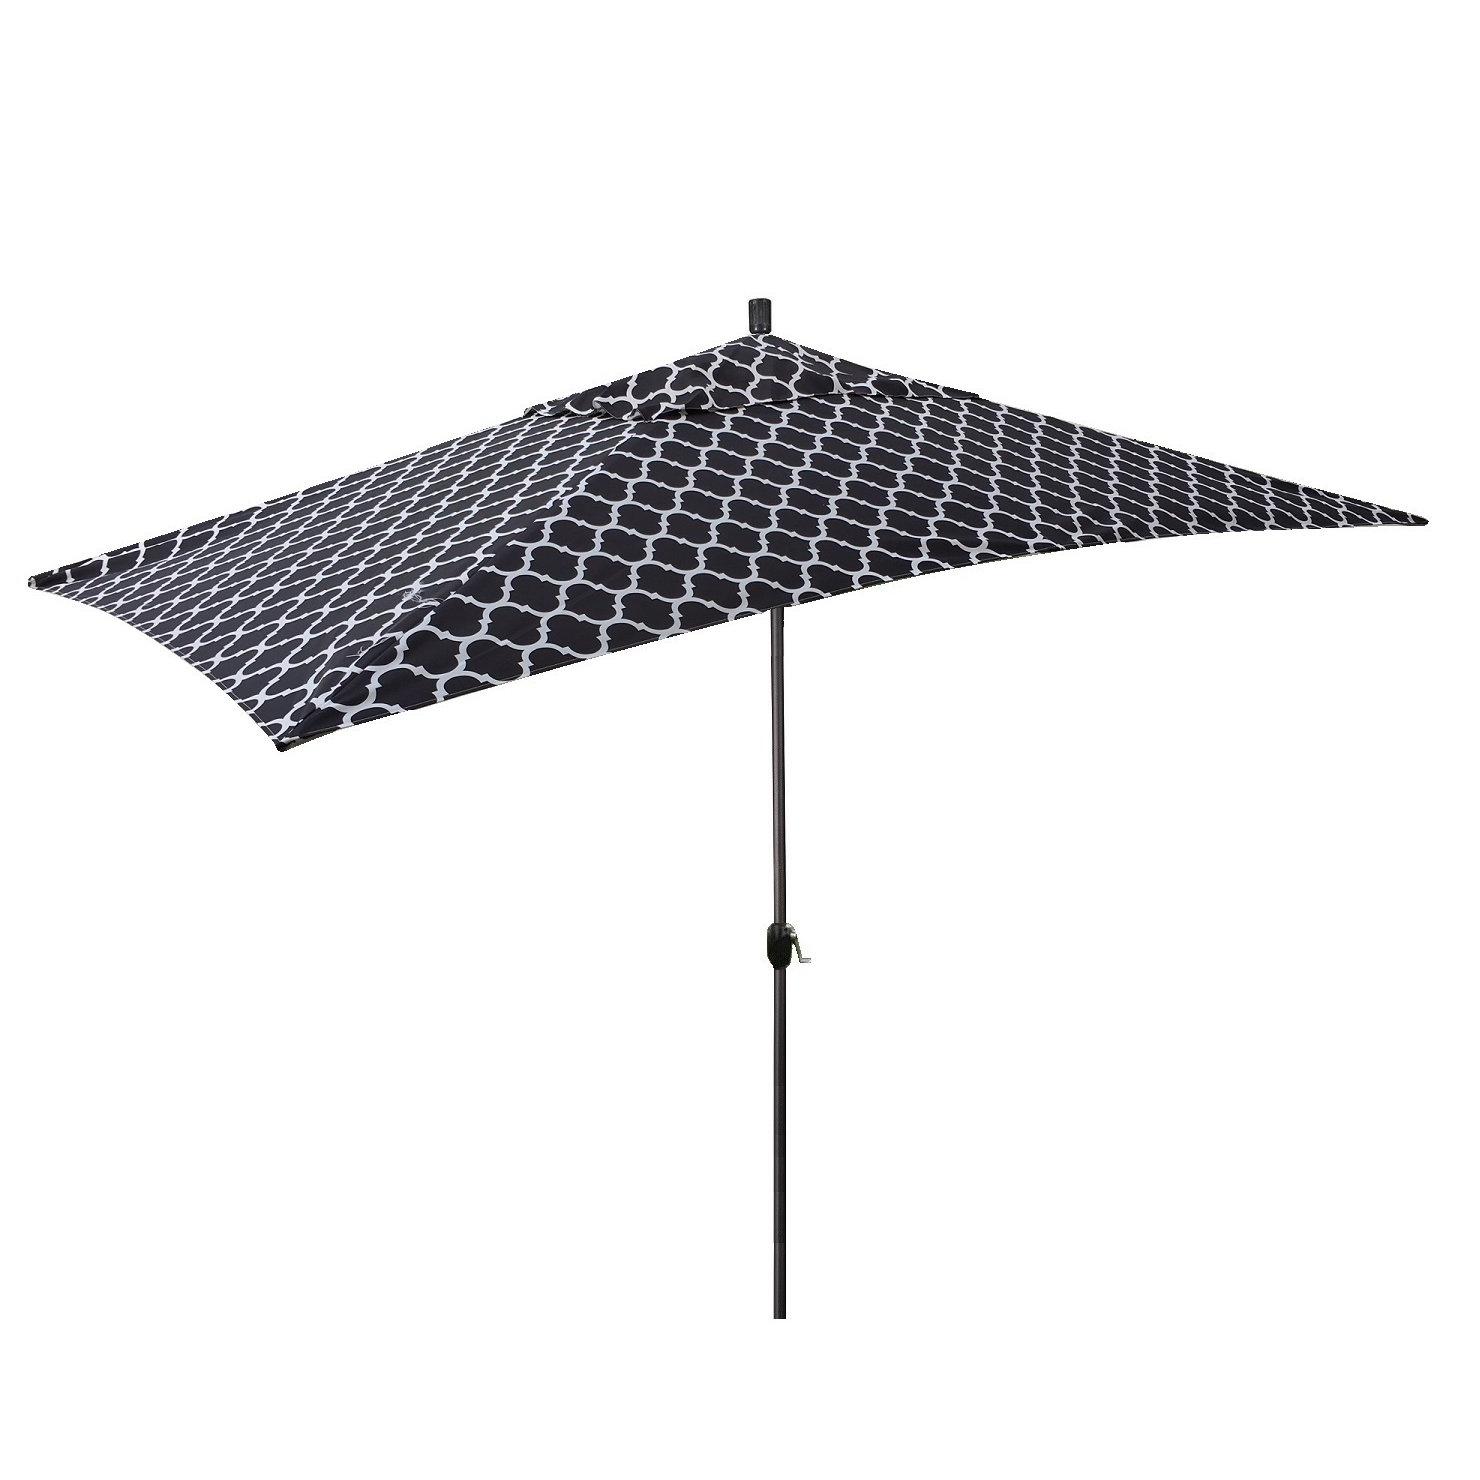 Sherlyn 10' X 6' Rectangular Market Umbrella Intended For Most Current Devansh Market Umbrellas (View 19 of 20)